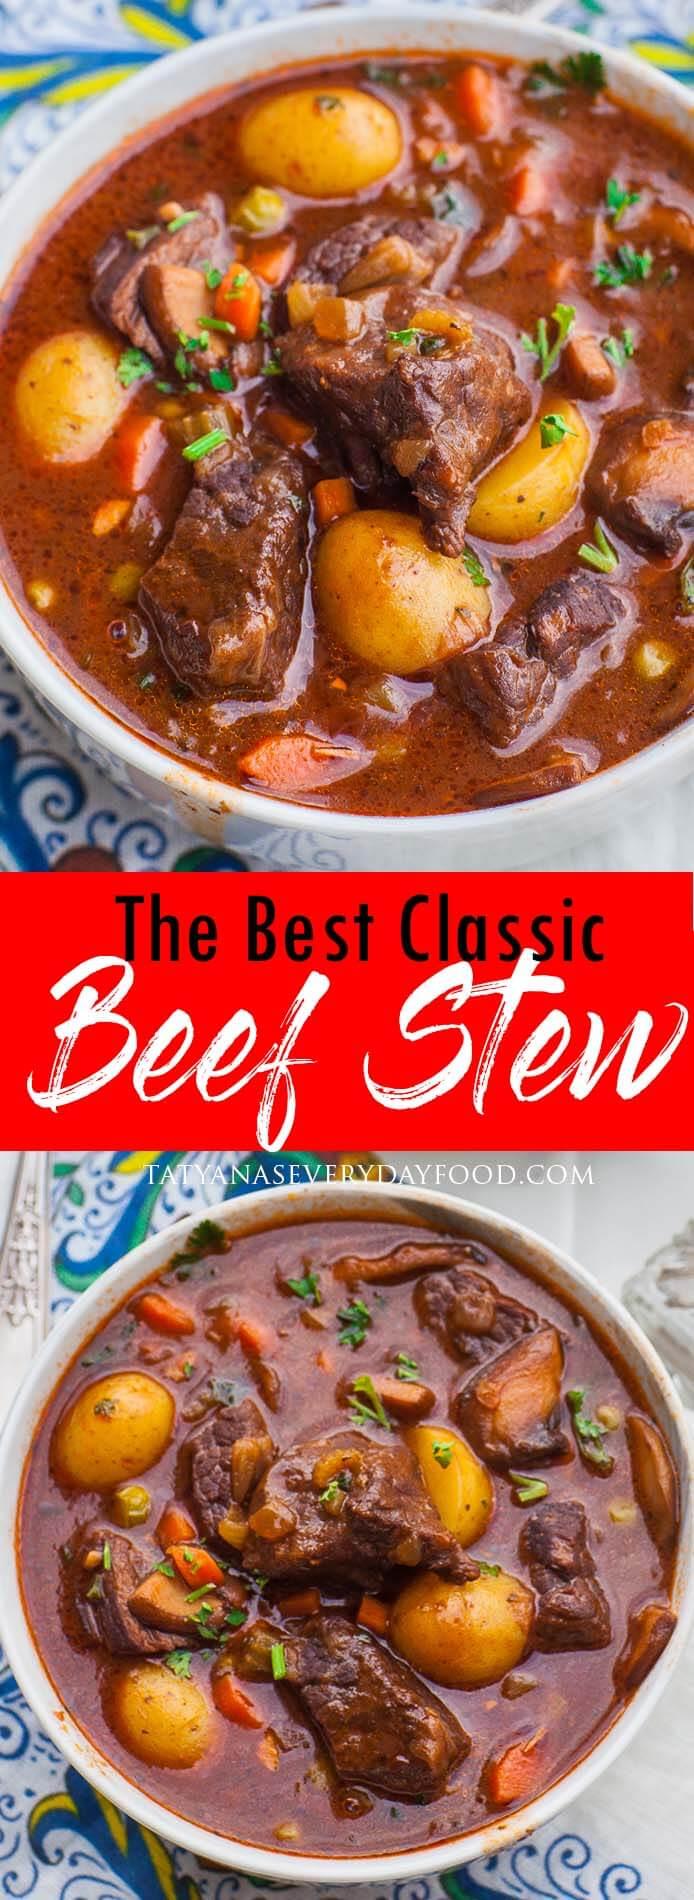 The Best Beef Stew video recipe